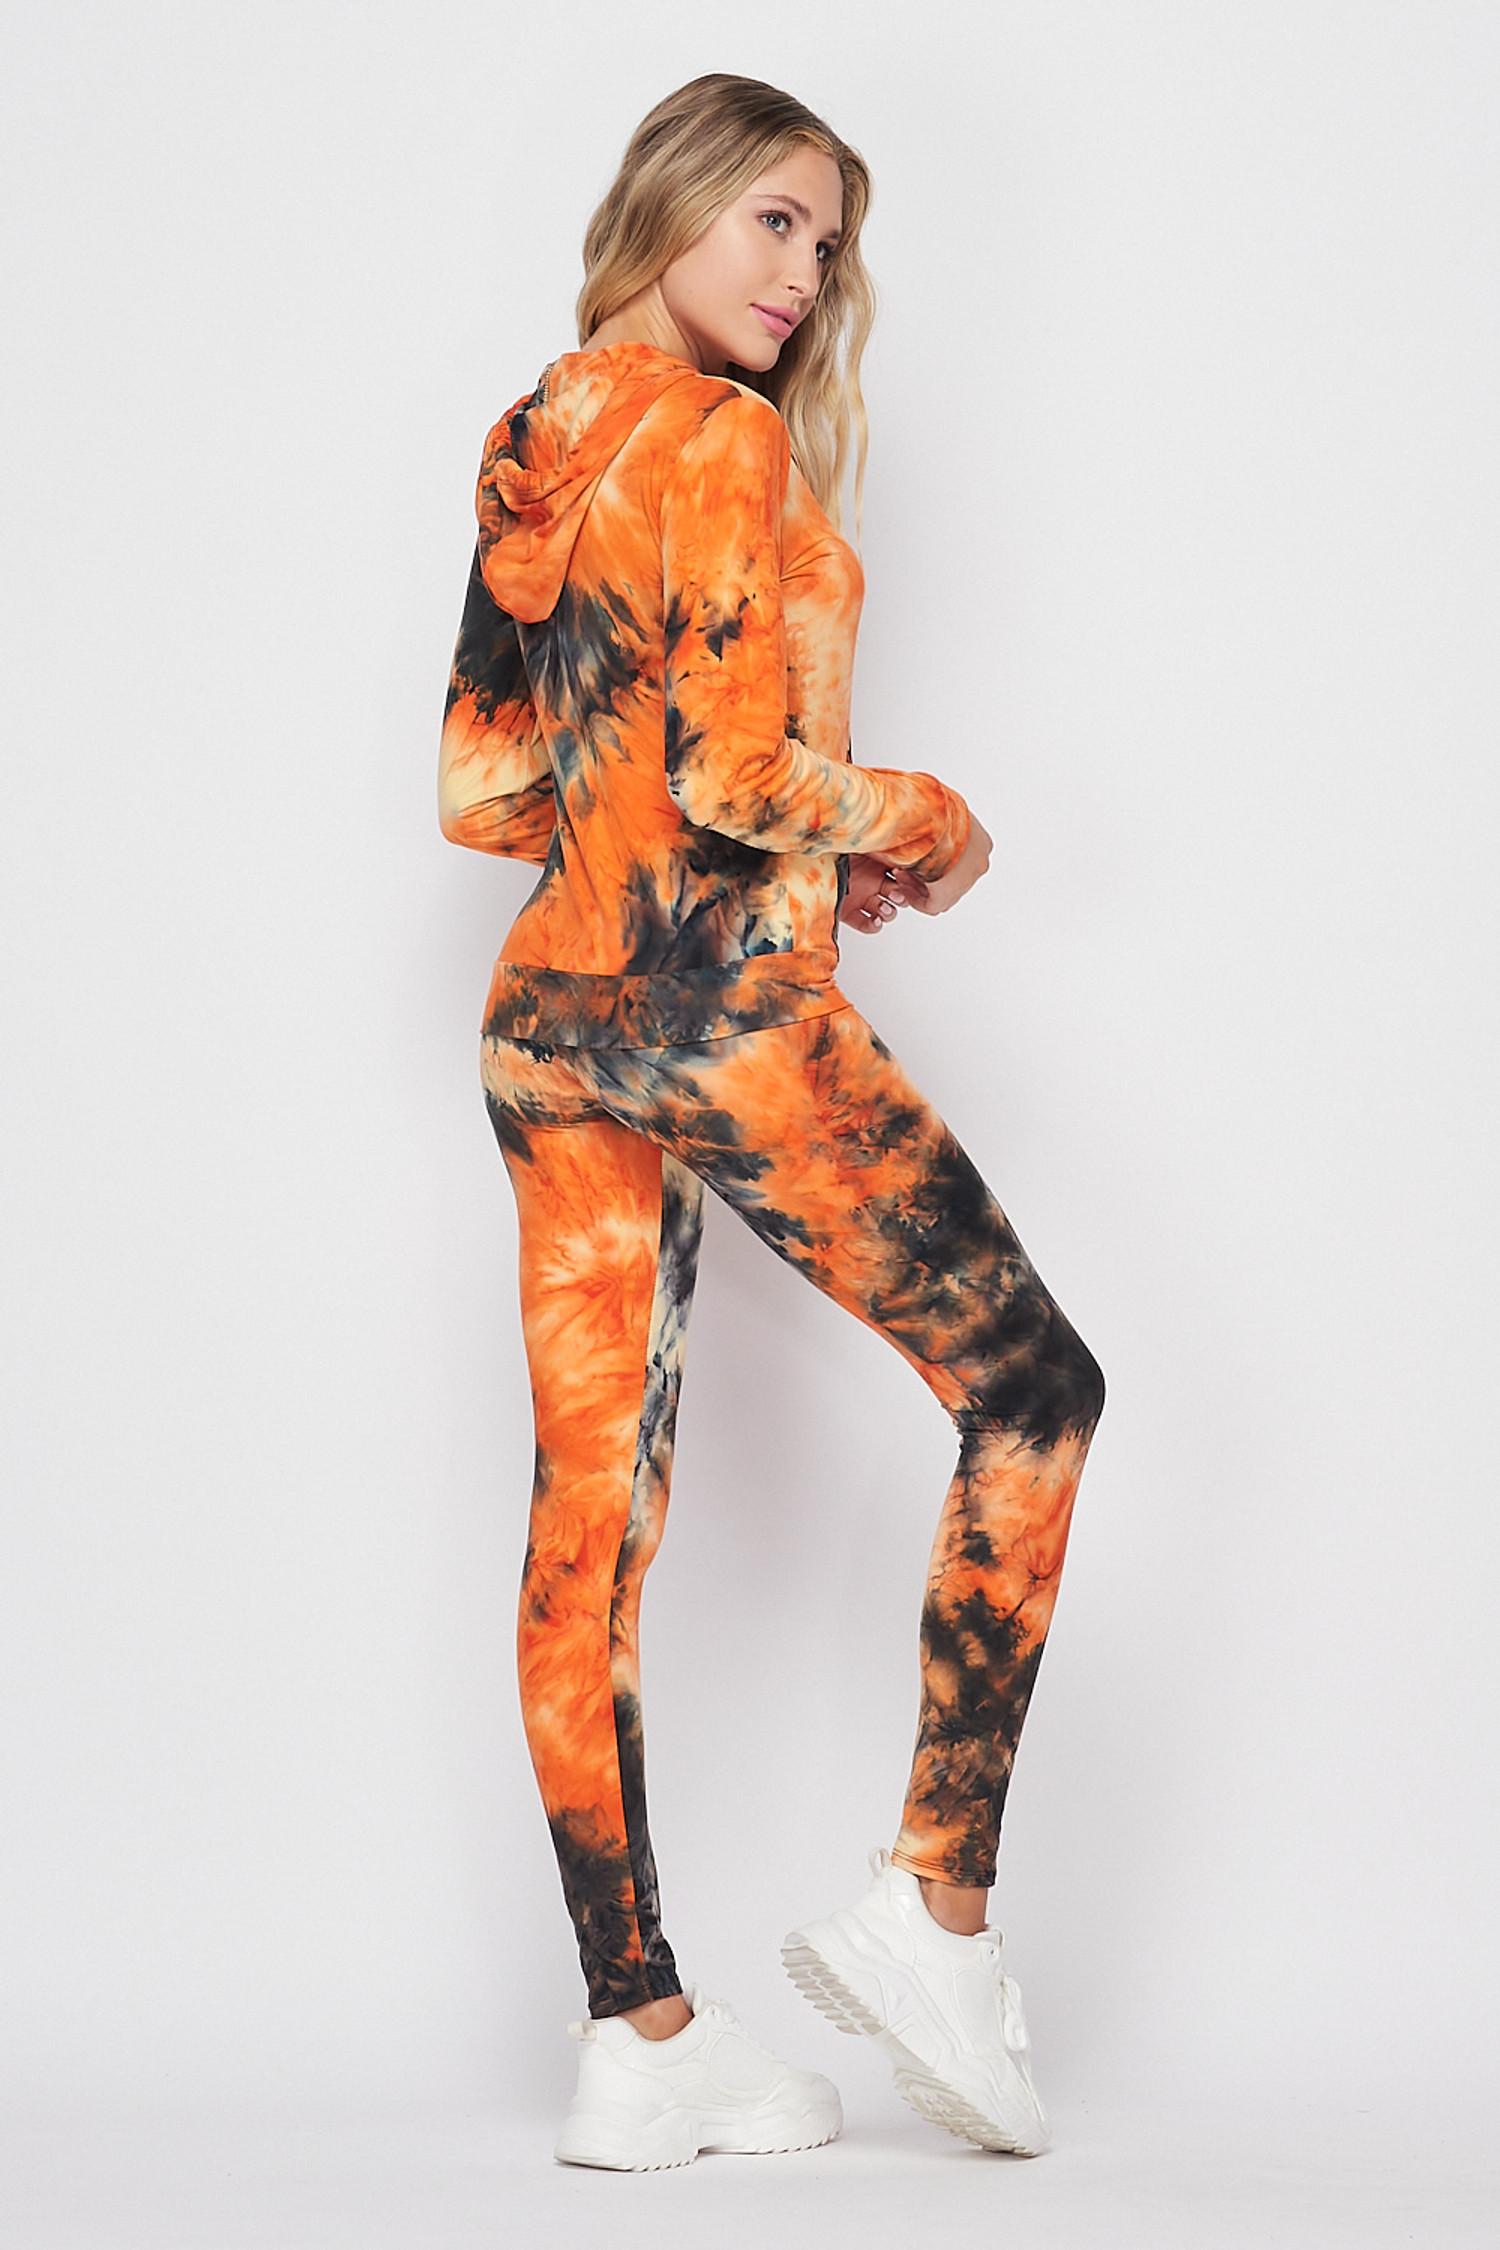 45 degree back/right side image of Orange Tie Dye 2 Piece Leggings and Hooded Jacket Set